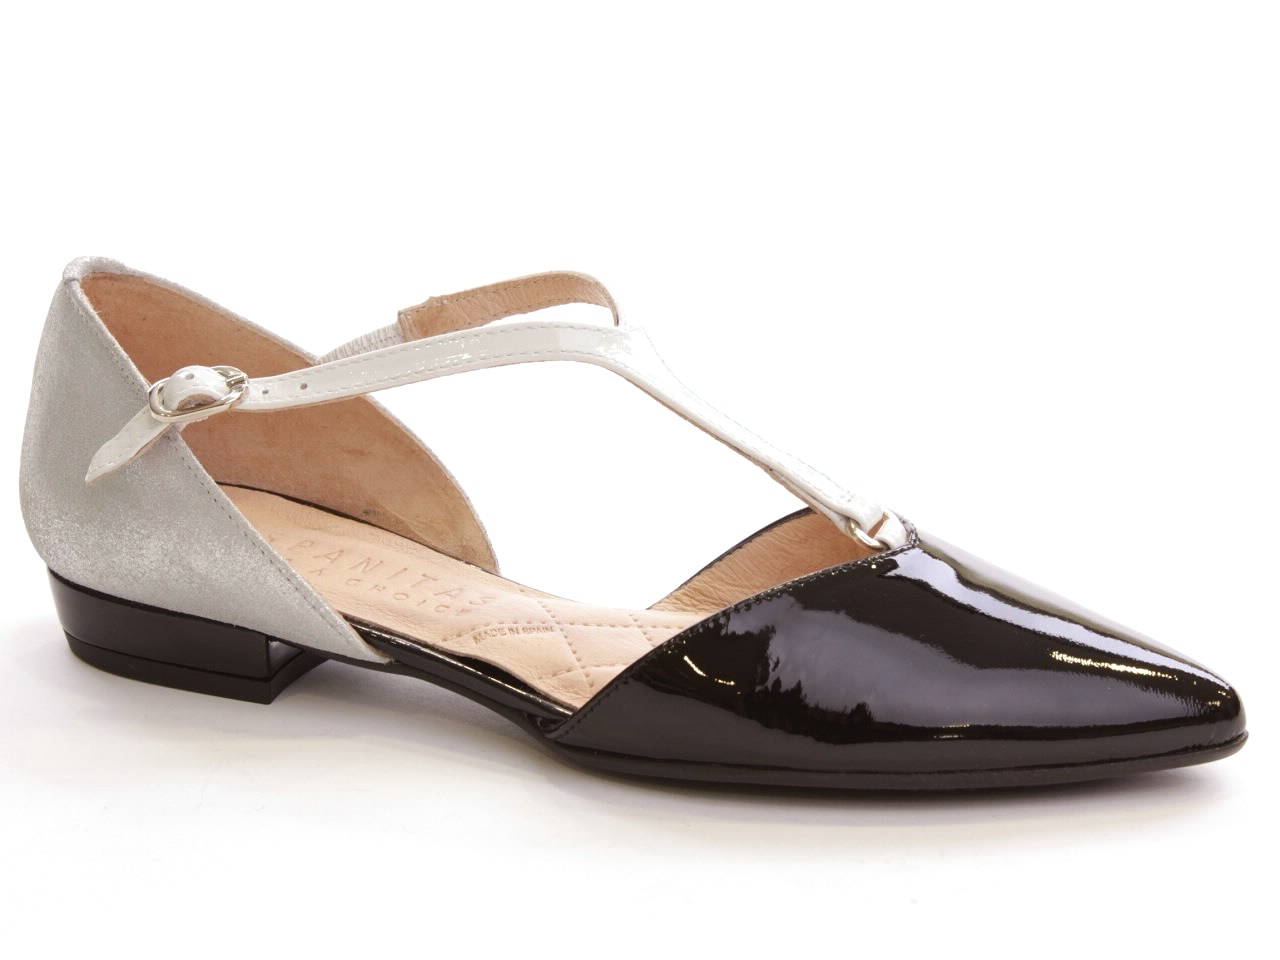 Zapatos Planos, Sabrinas, Mocassins Hispanitas - 165 CHV51191